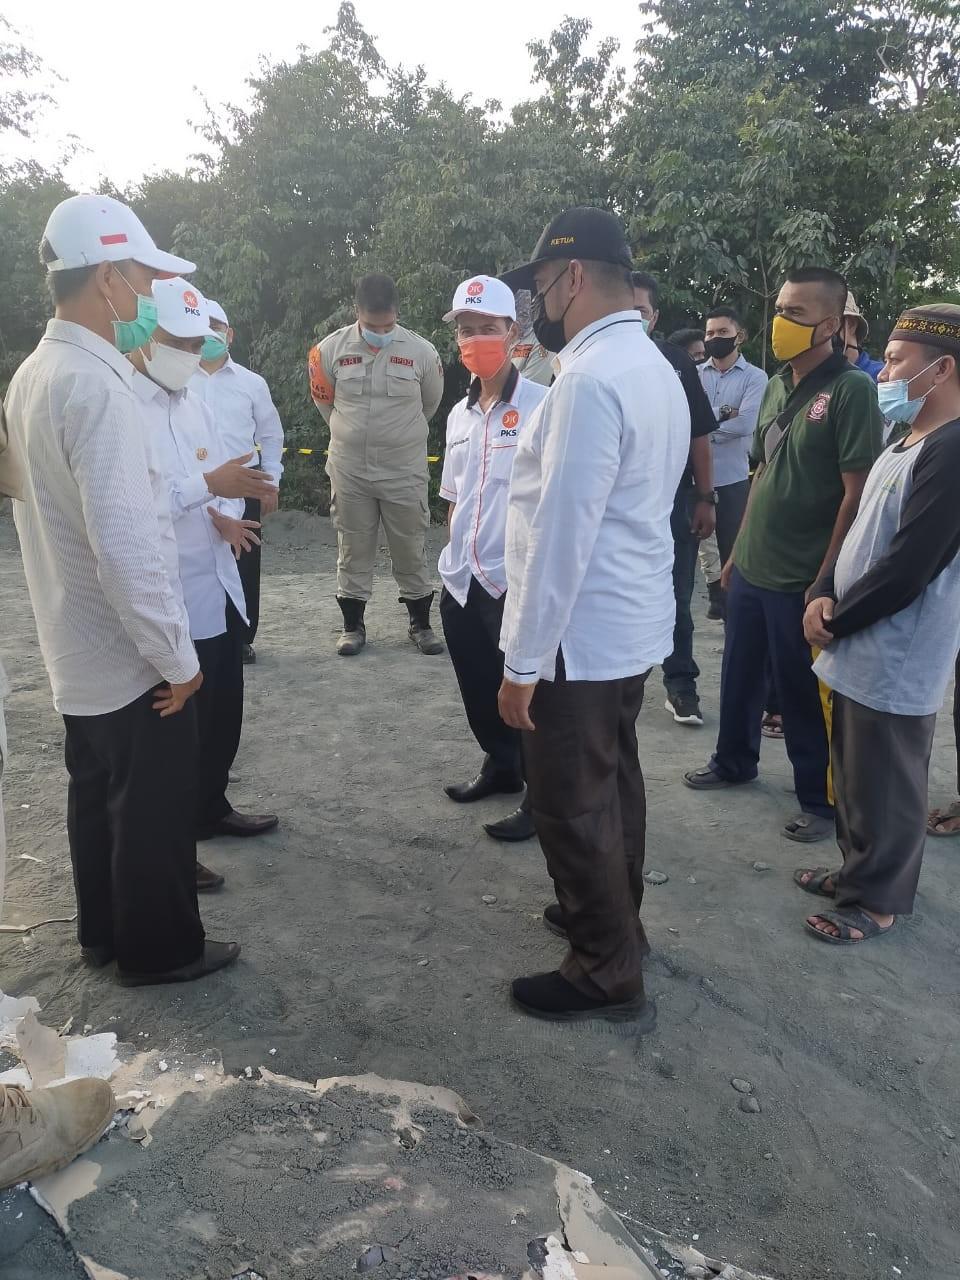 Ketua DPRD Pekanbaru : Semburan Gas Harus Segera Ditangani Dengan Baik